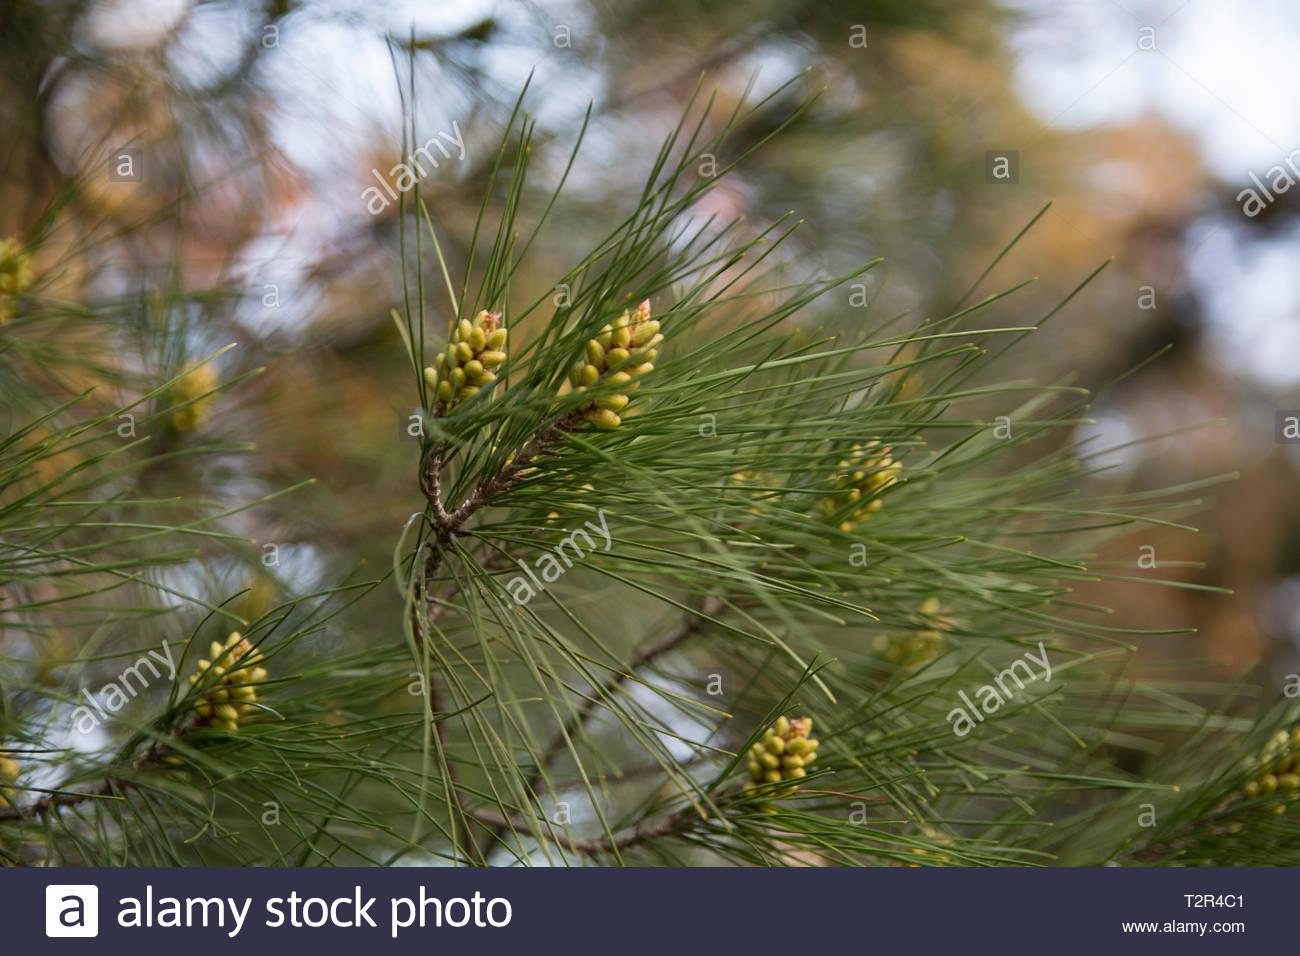 Spring Tree Nature. Greece 2019 - Stock Image